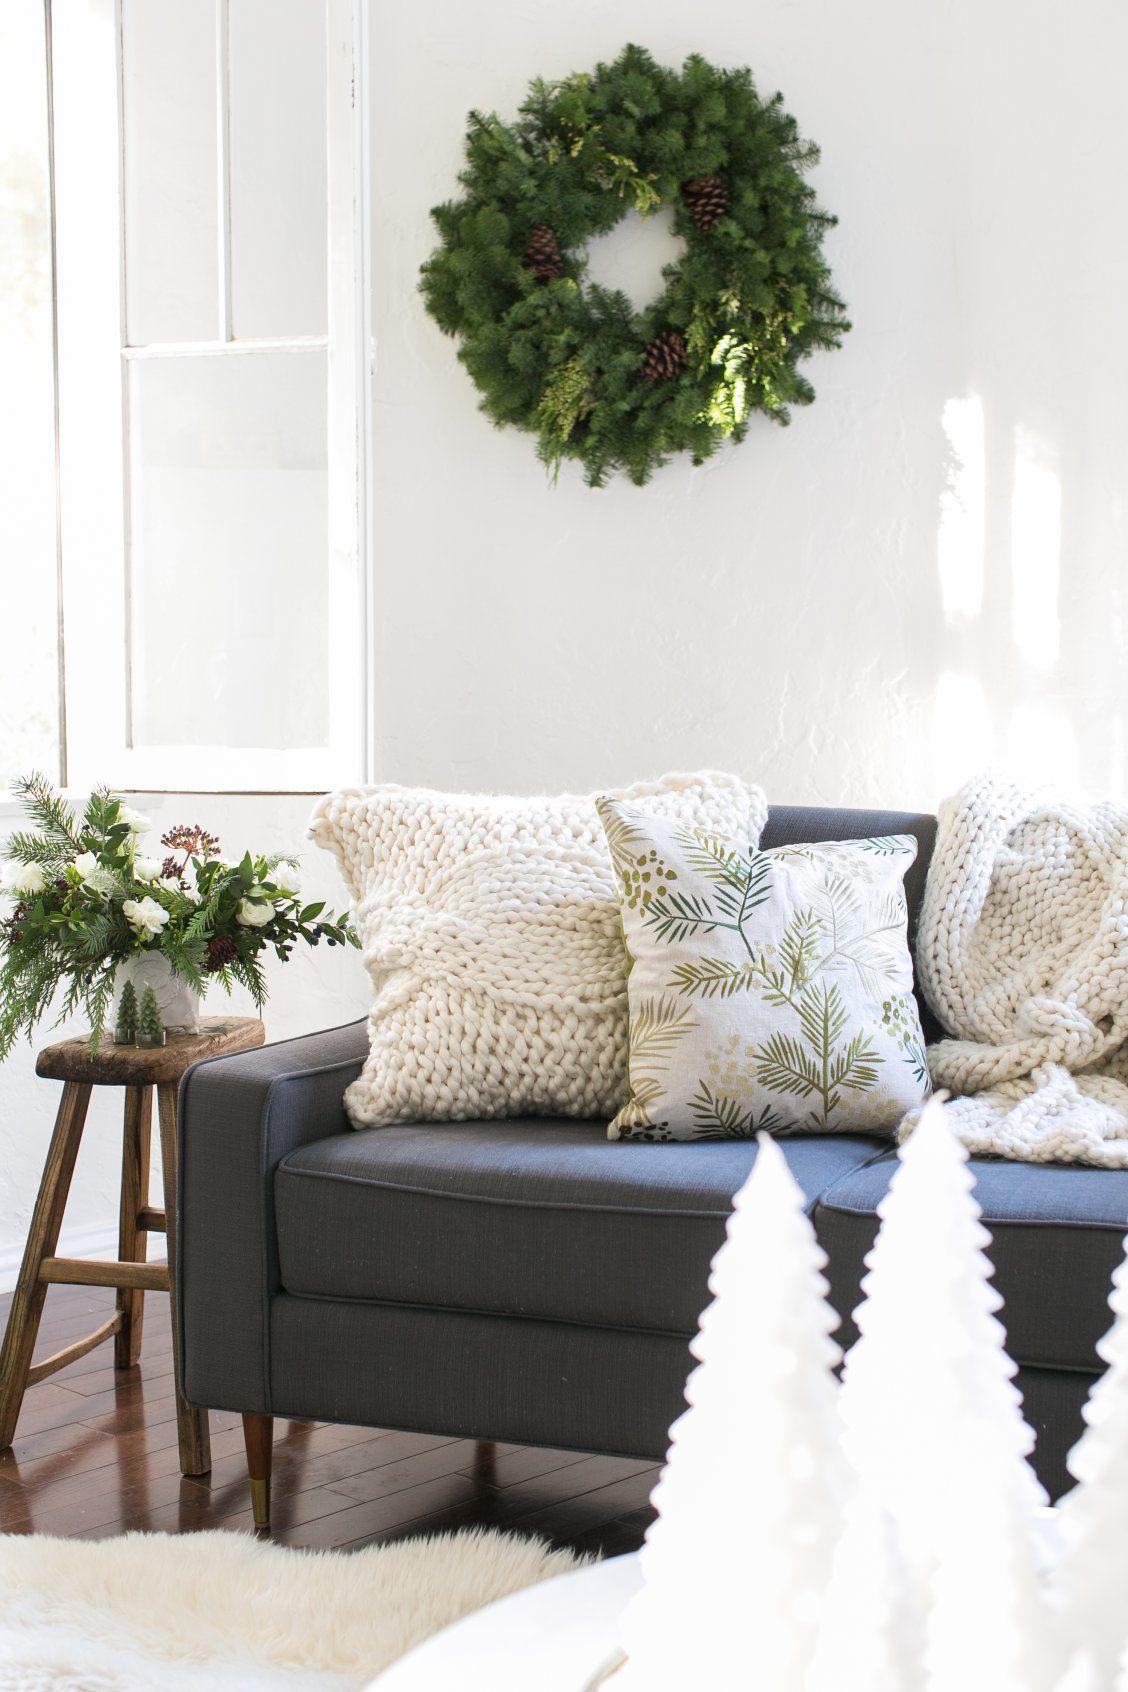 6 Last Minute Holiday Decorating Ideas | Pinterest | Decorating ...